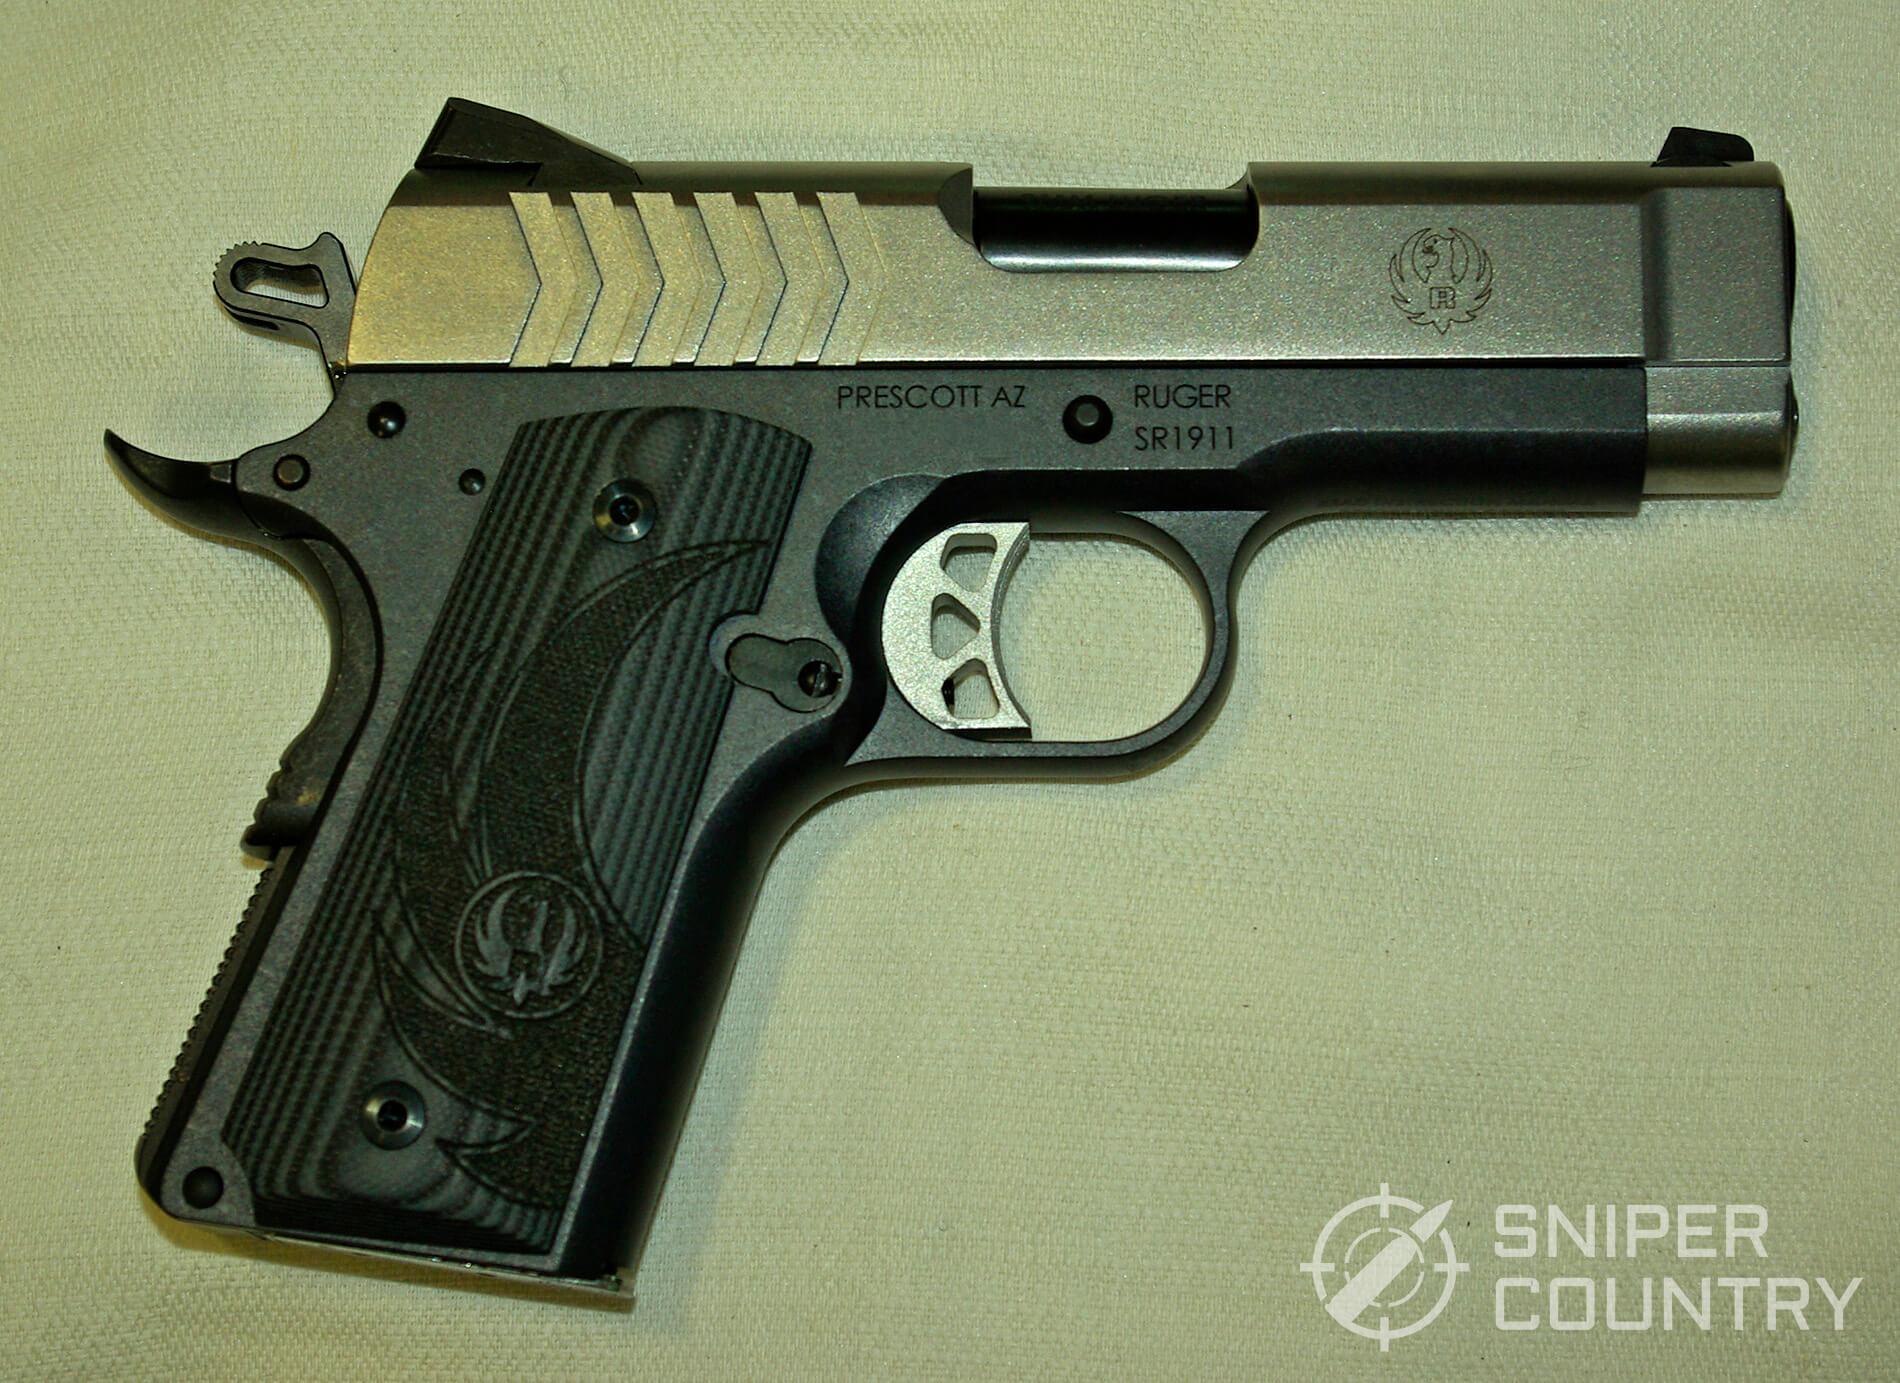 Ruger SR1911-9mm Compact